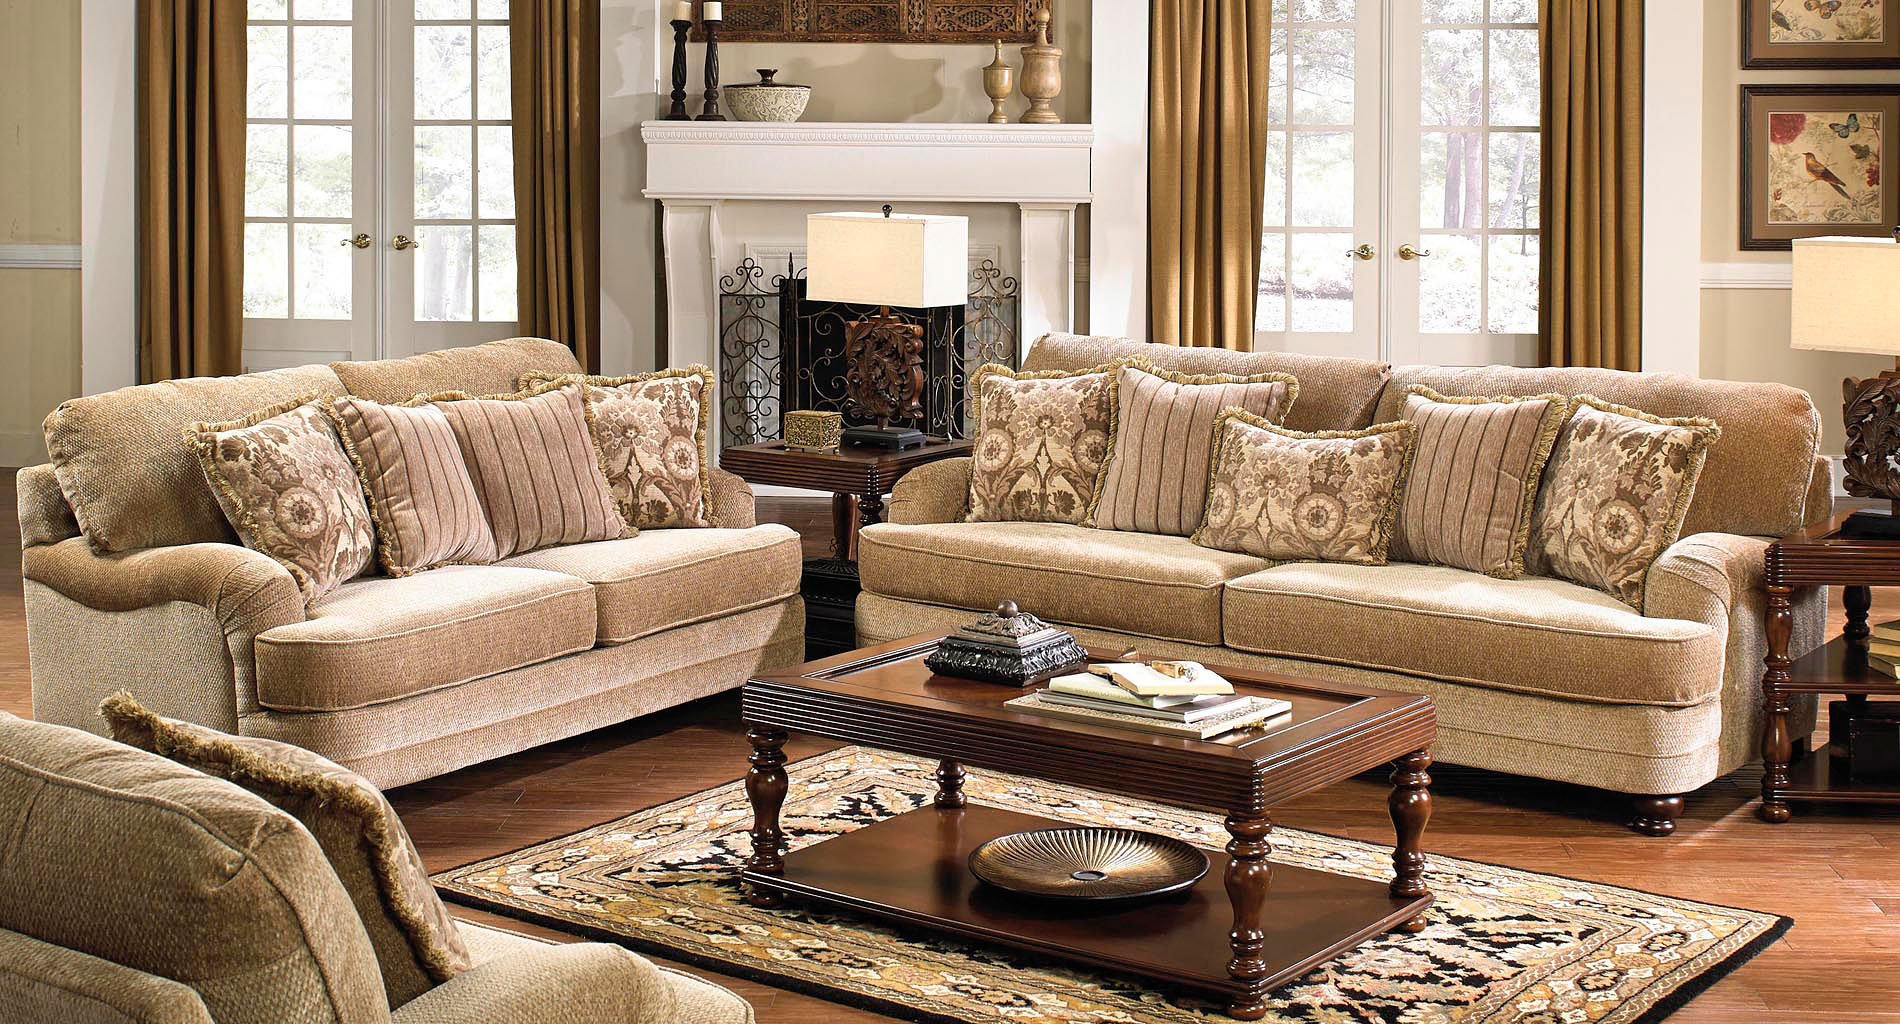 Brennan Living Room Set (Camel) Jackson Furniture   Furniture Cart Pertaining To Brennan Sofa Chairs (Image 6 of 25)